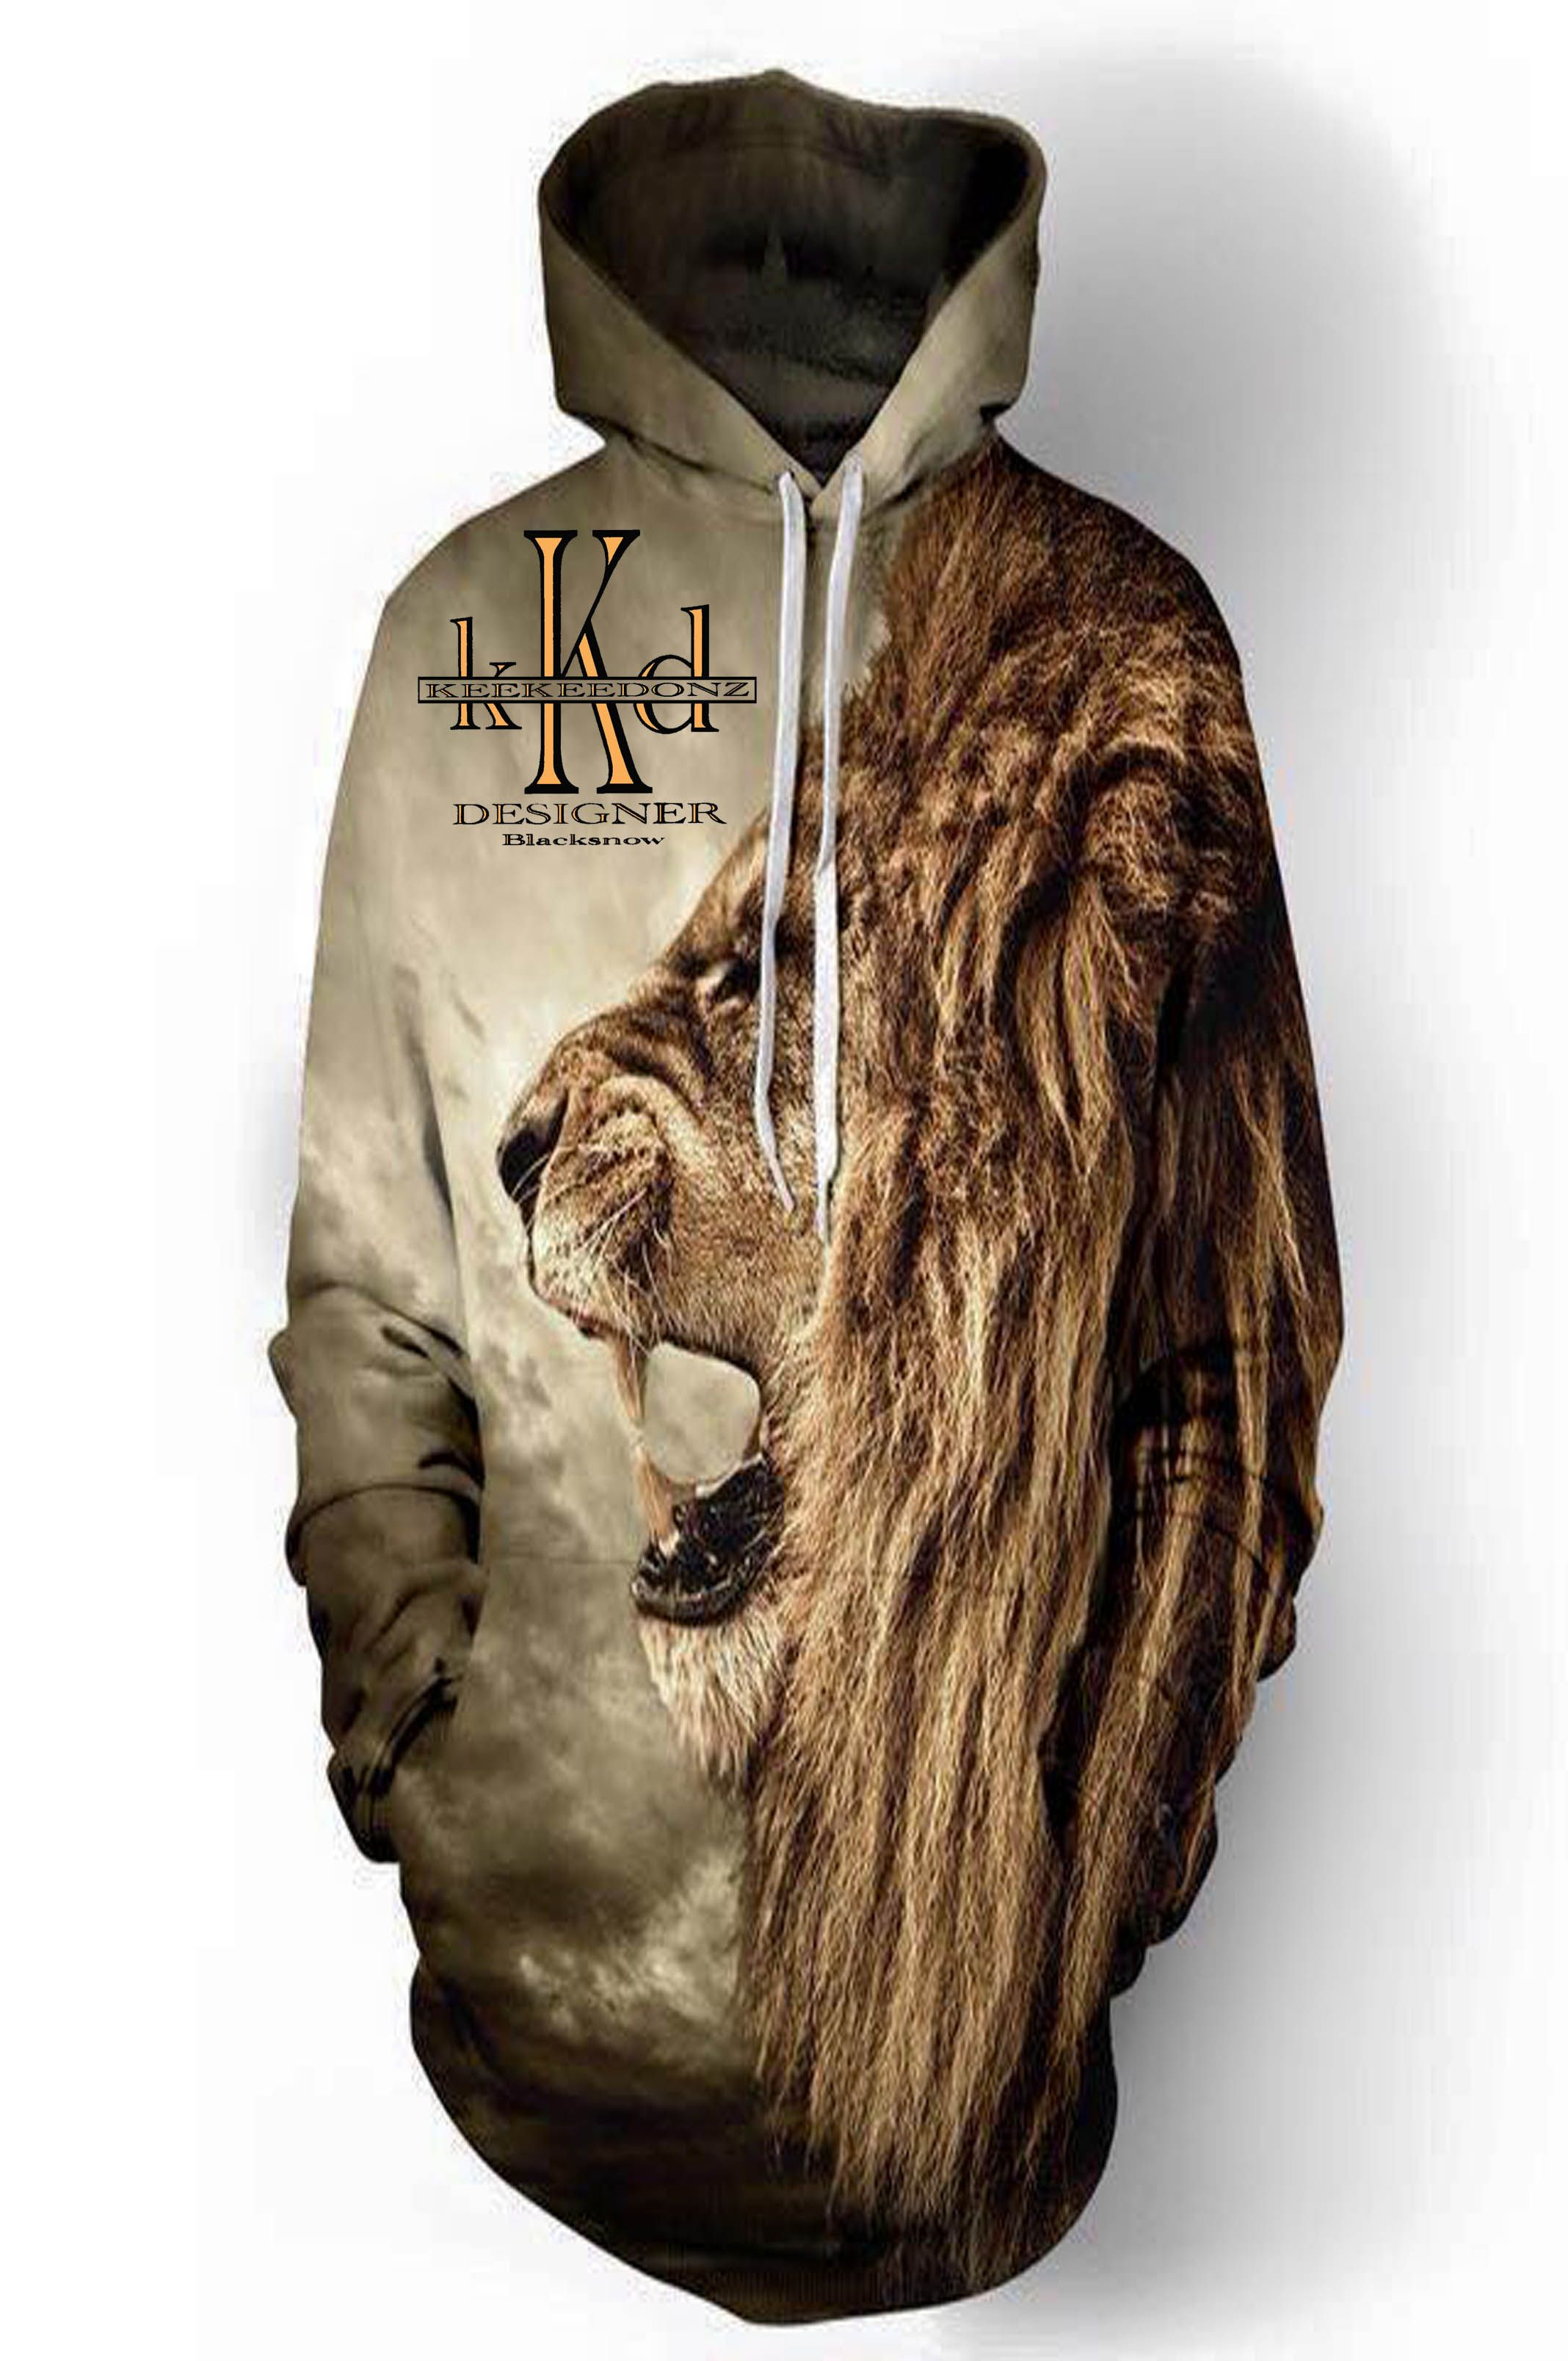 df7113fdb328 The Conquering Lion Of Judah Hoody  KeeKeeDonz  designer  KKDApparel ...